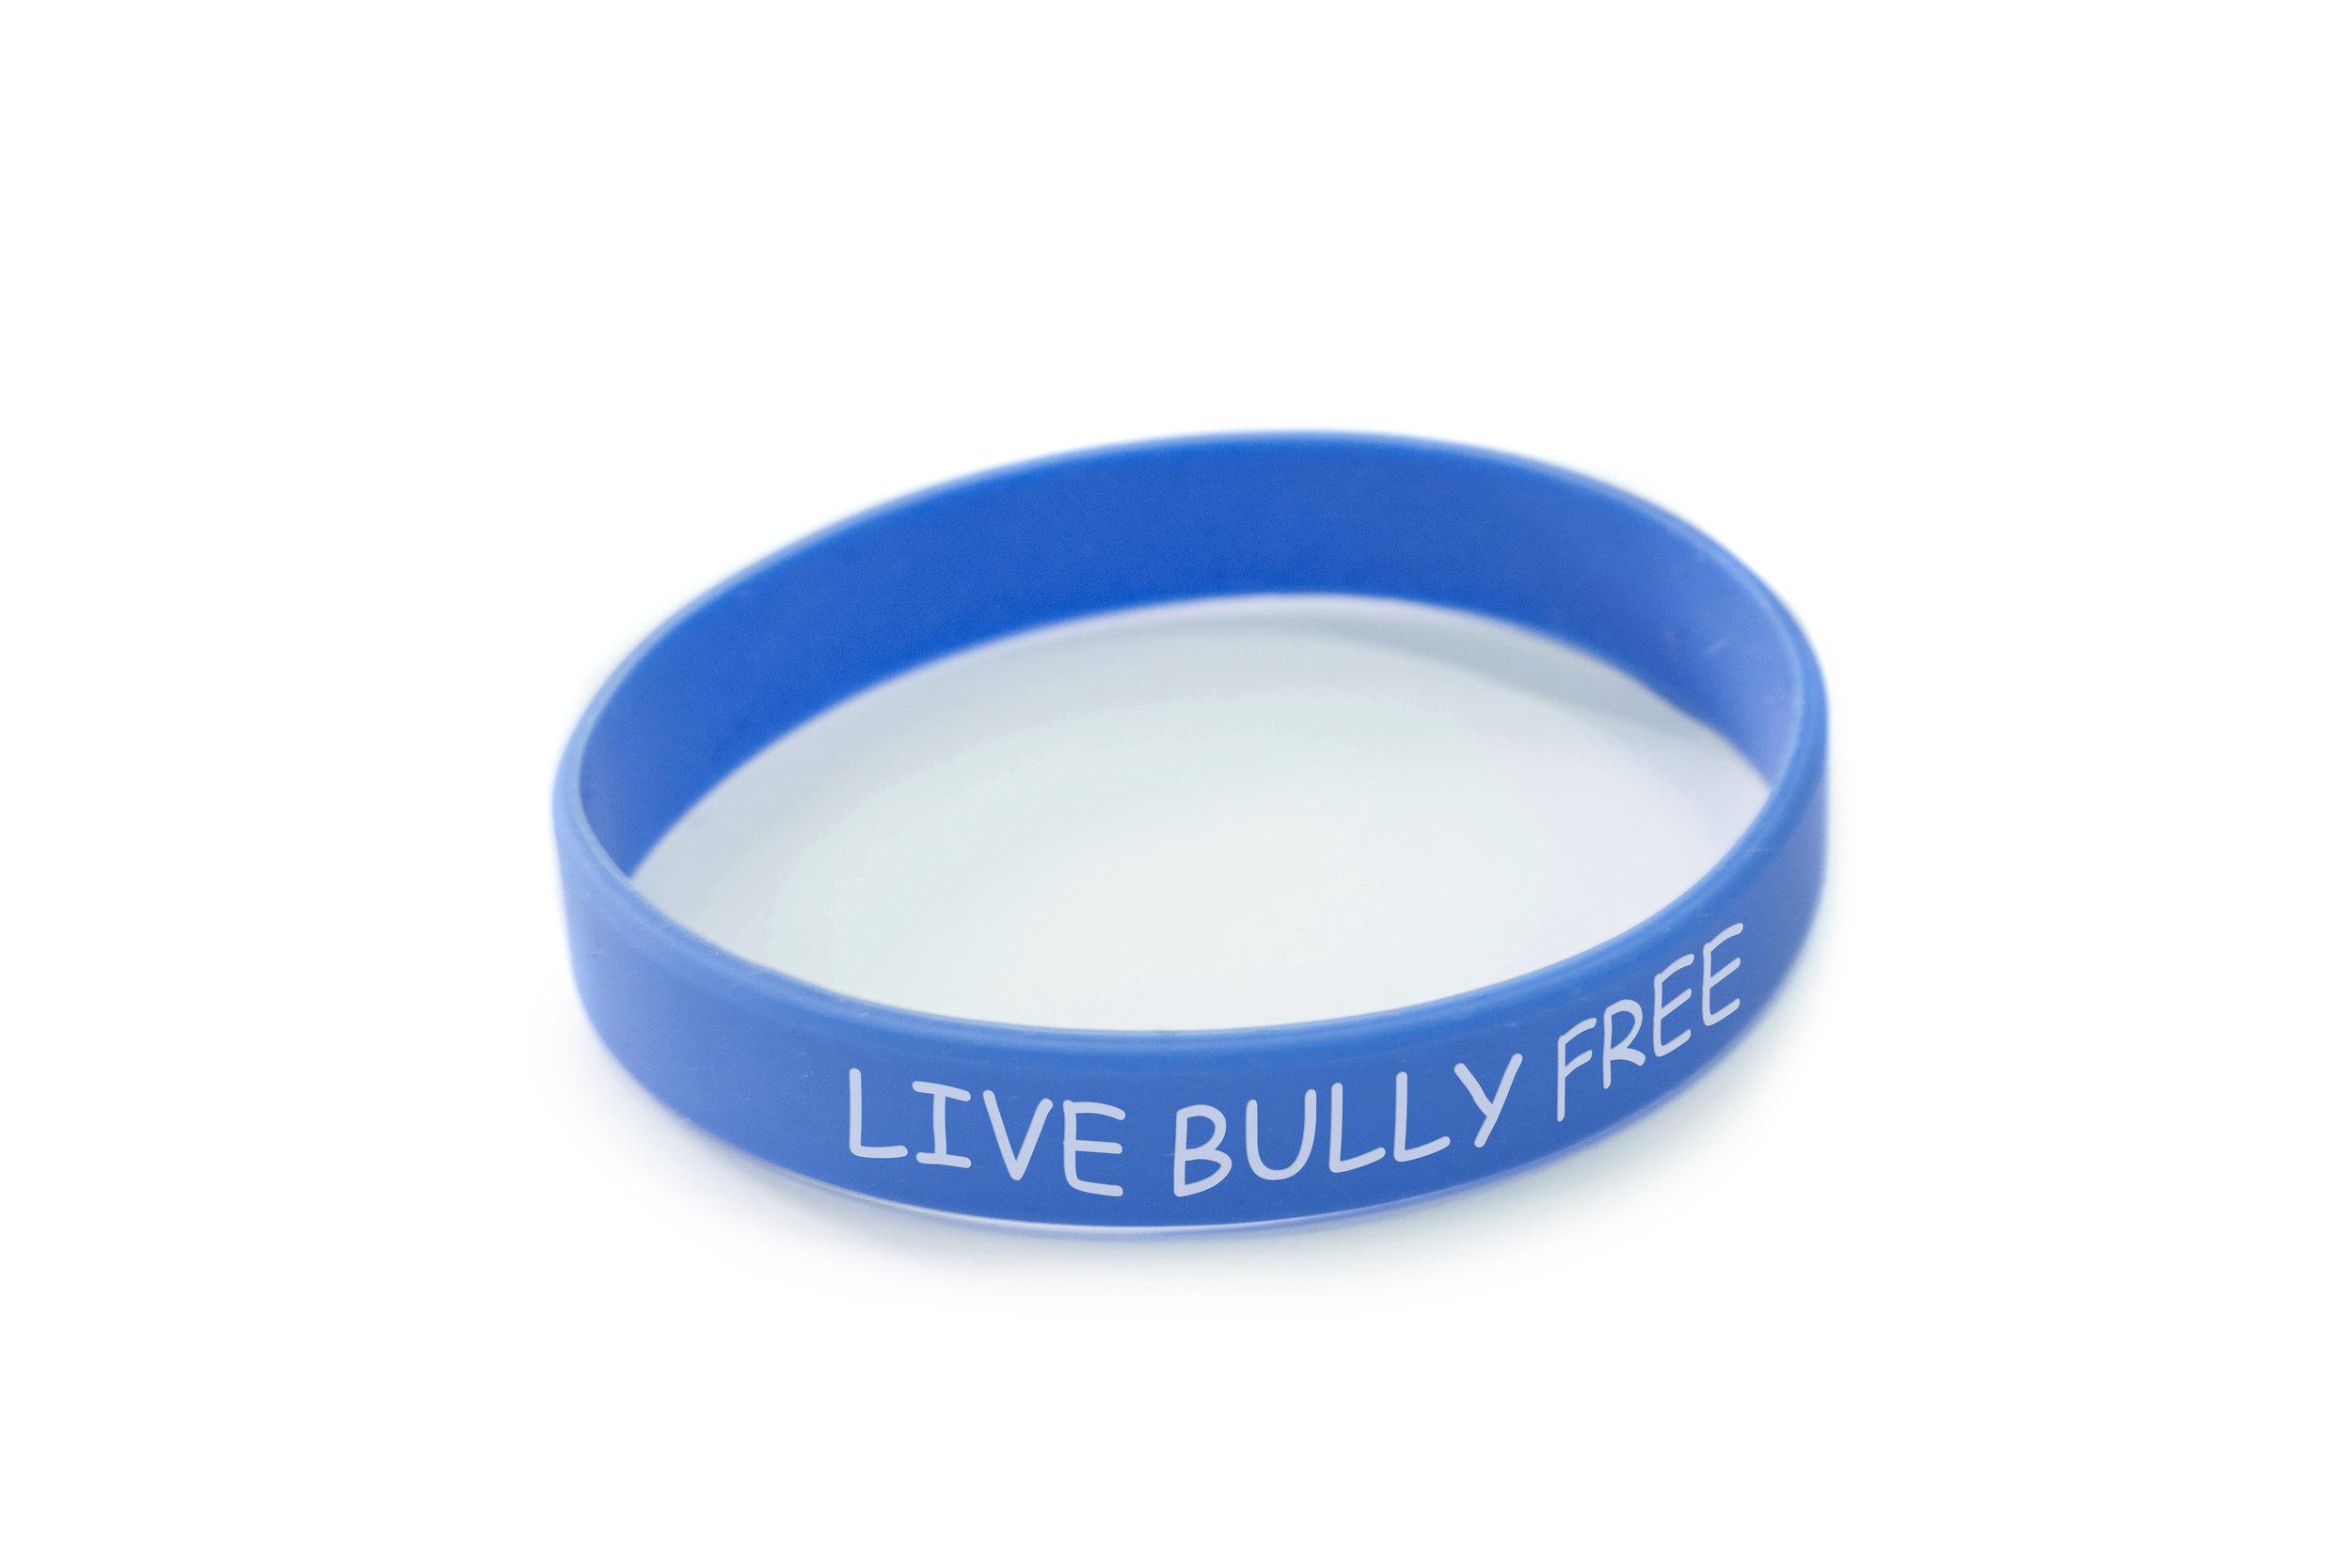 Live Bully Free.jpg